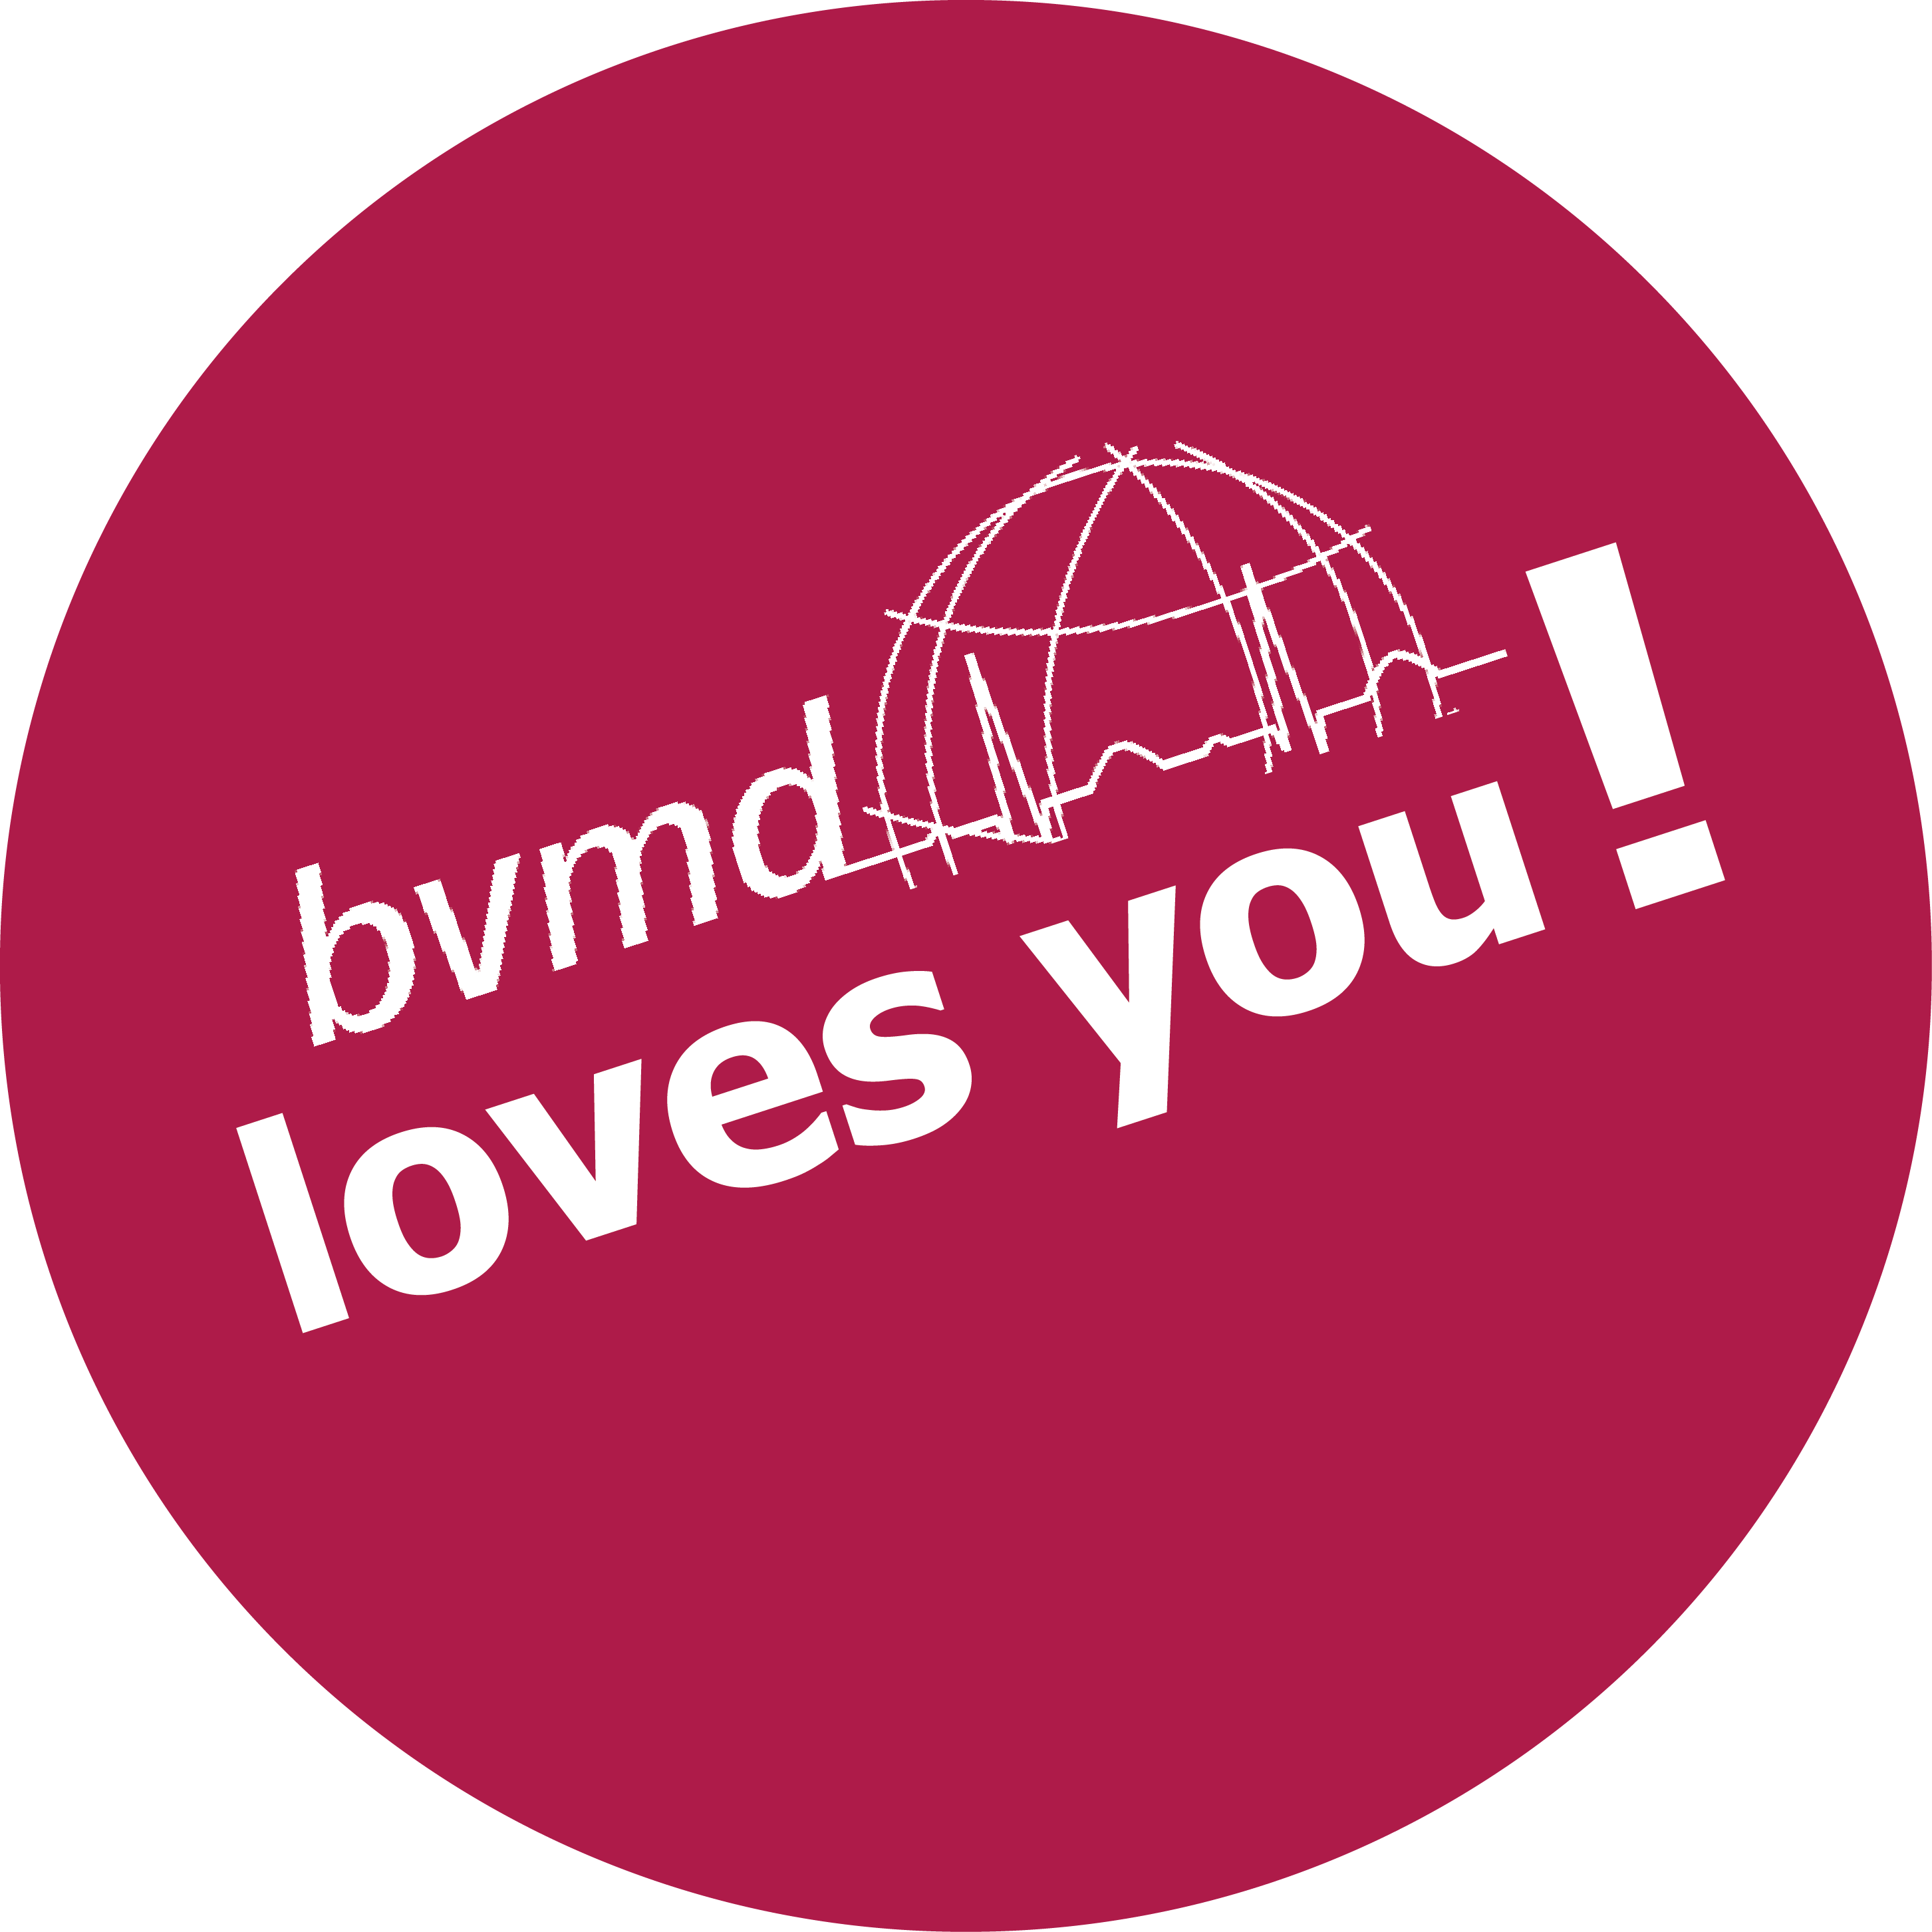 logo bvmd